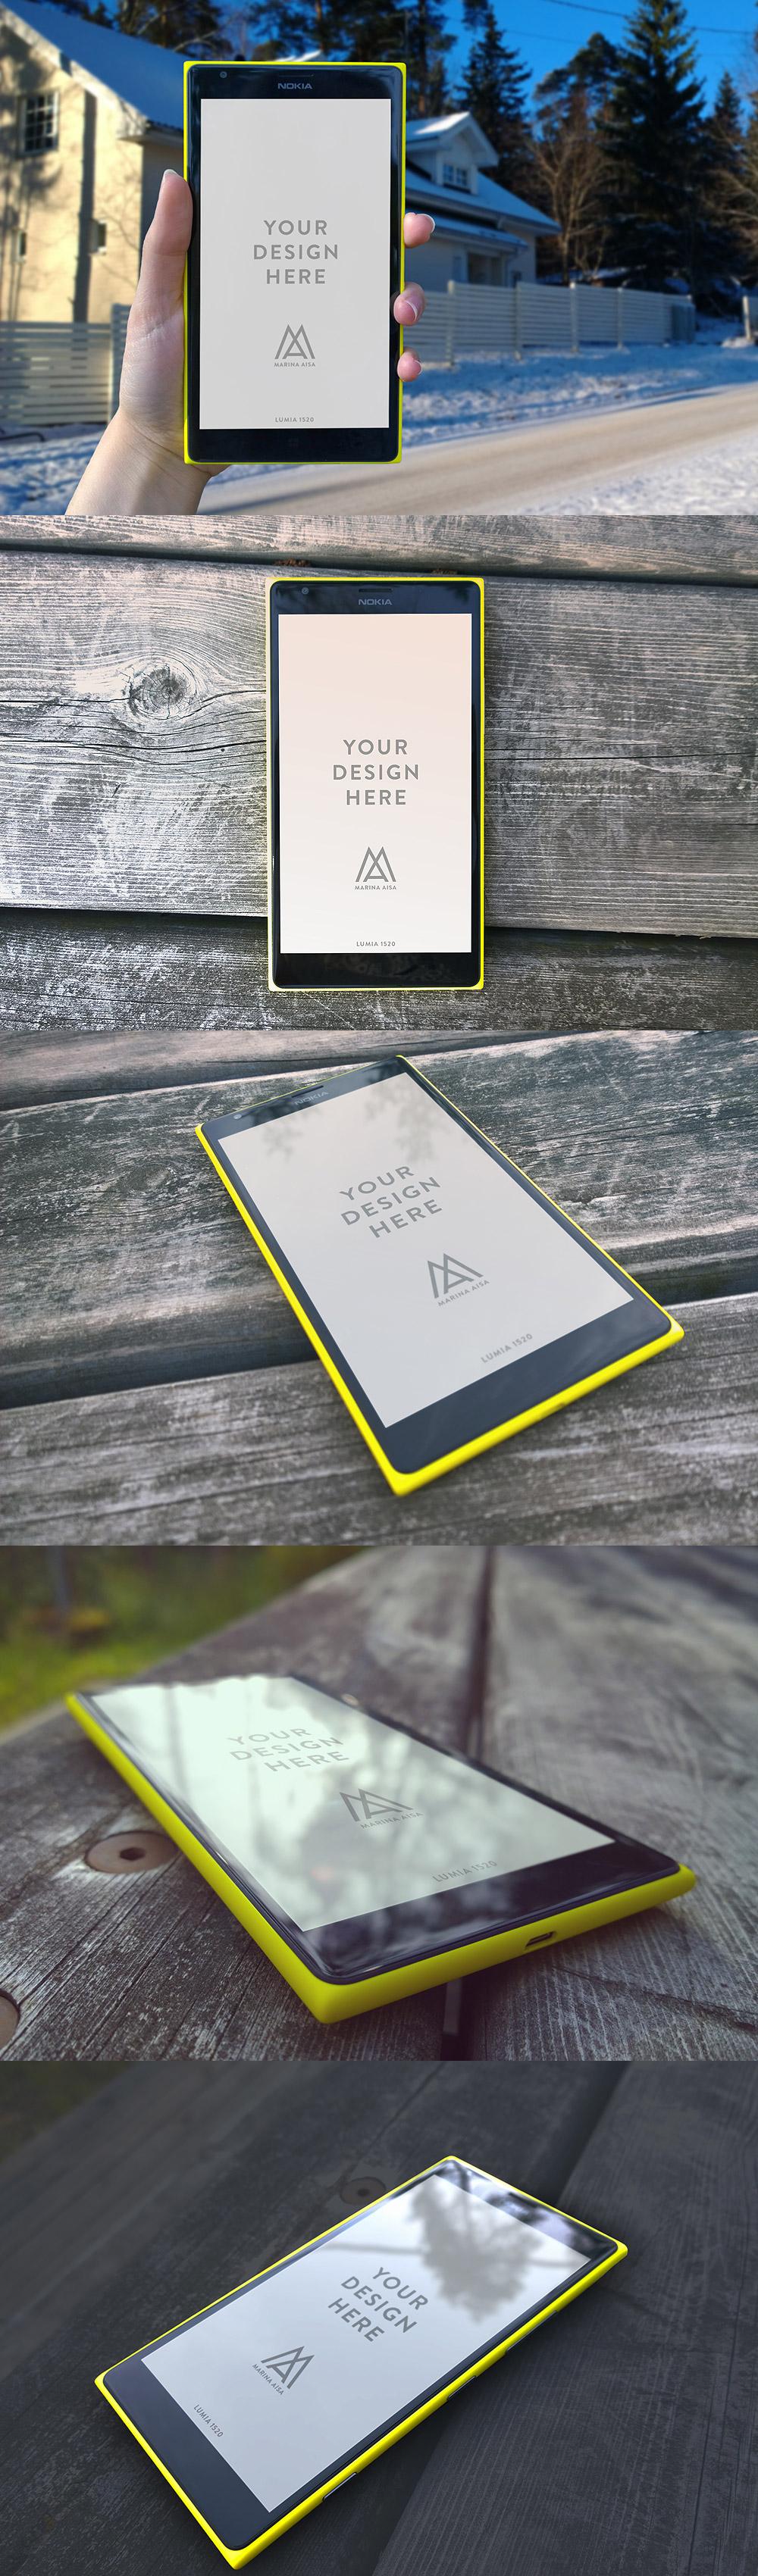 http://www.graphicsfuel.com/wp-content/uploads/2015/01/Nokia-Lumia-Mockups.jpg